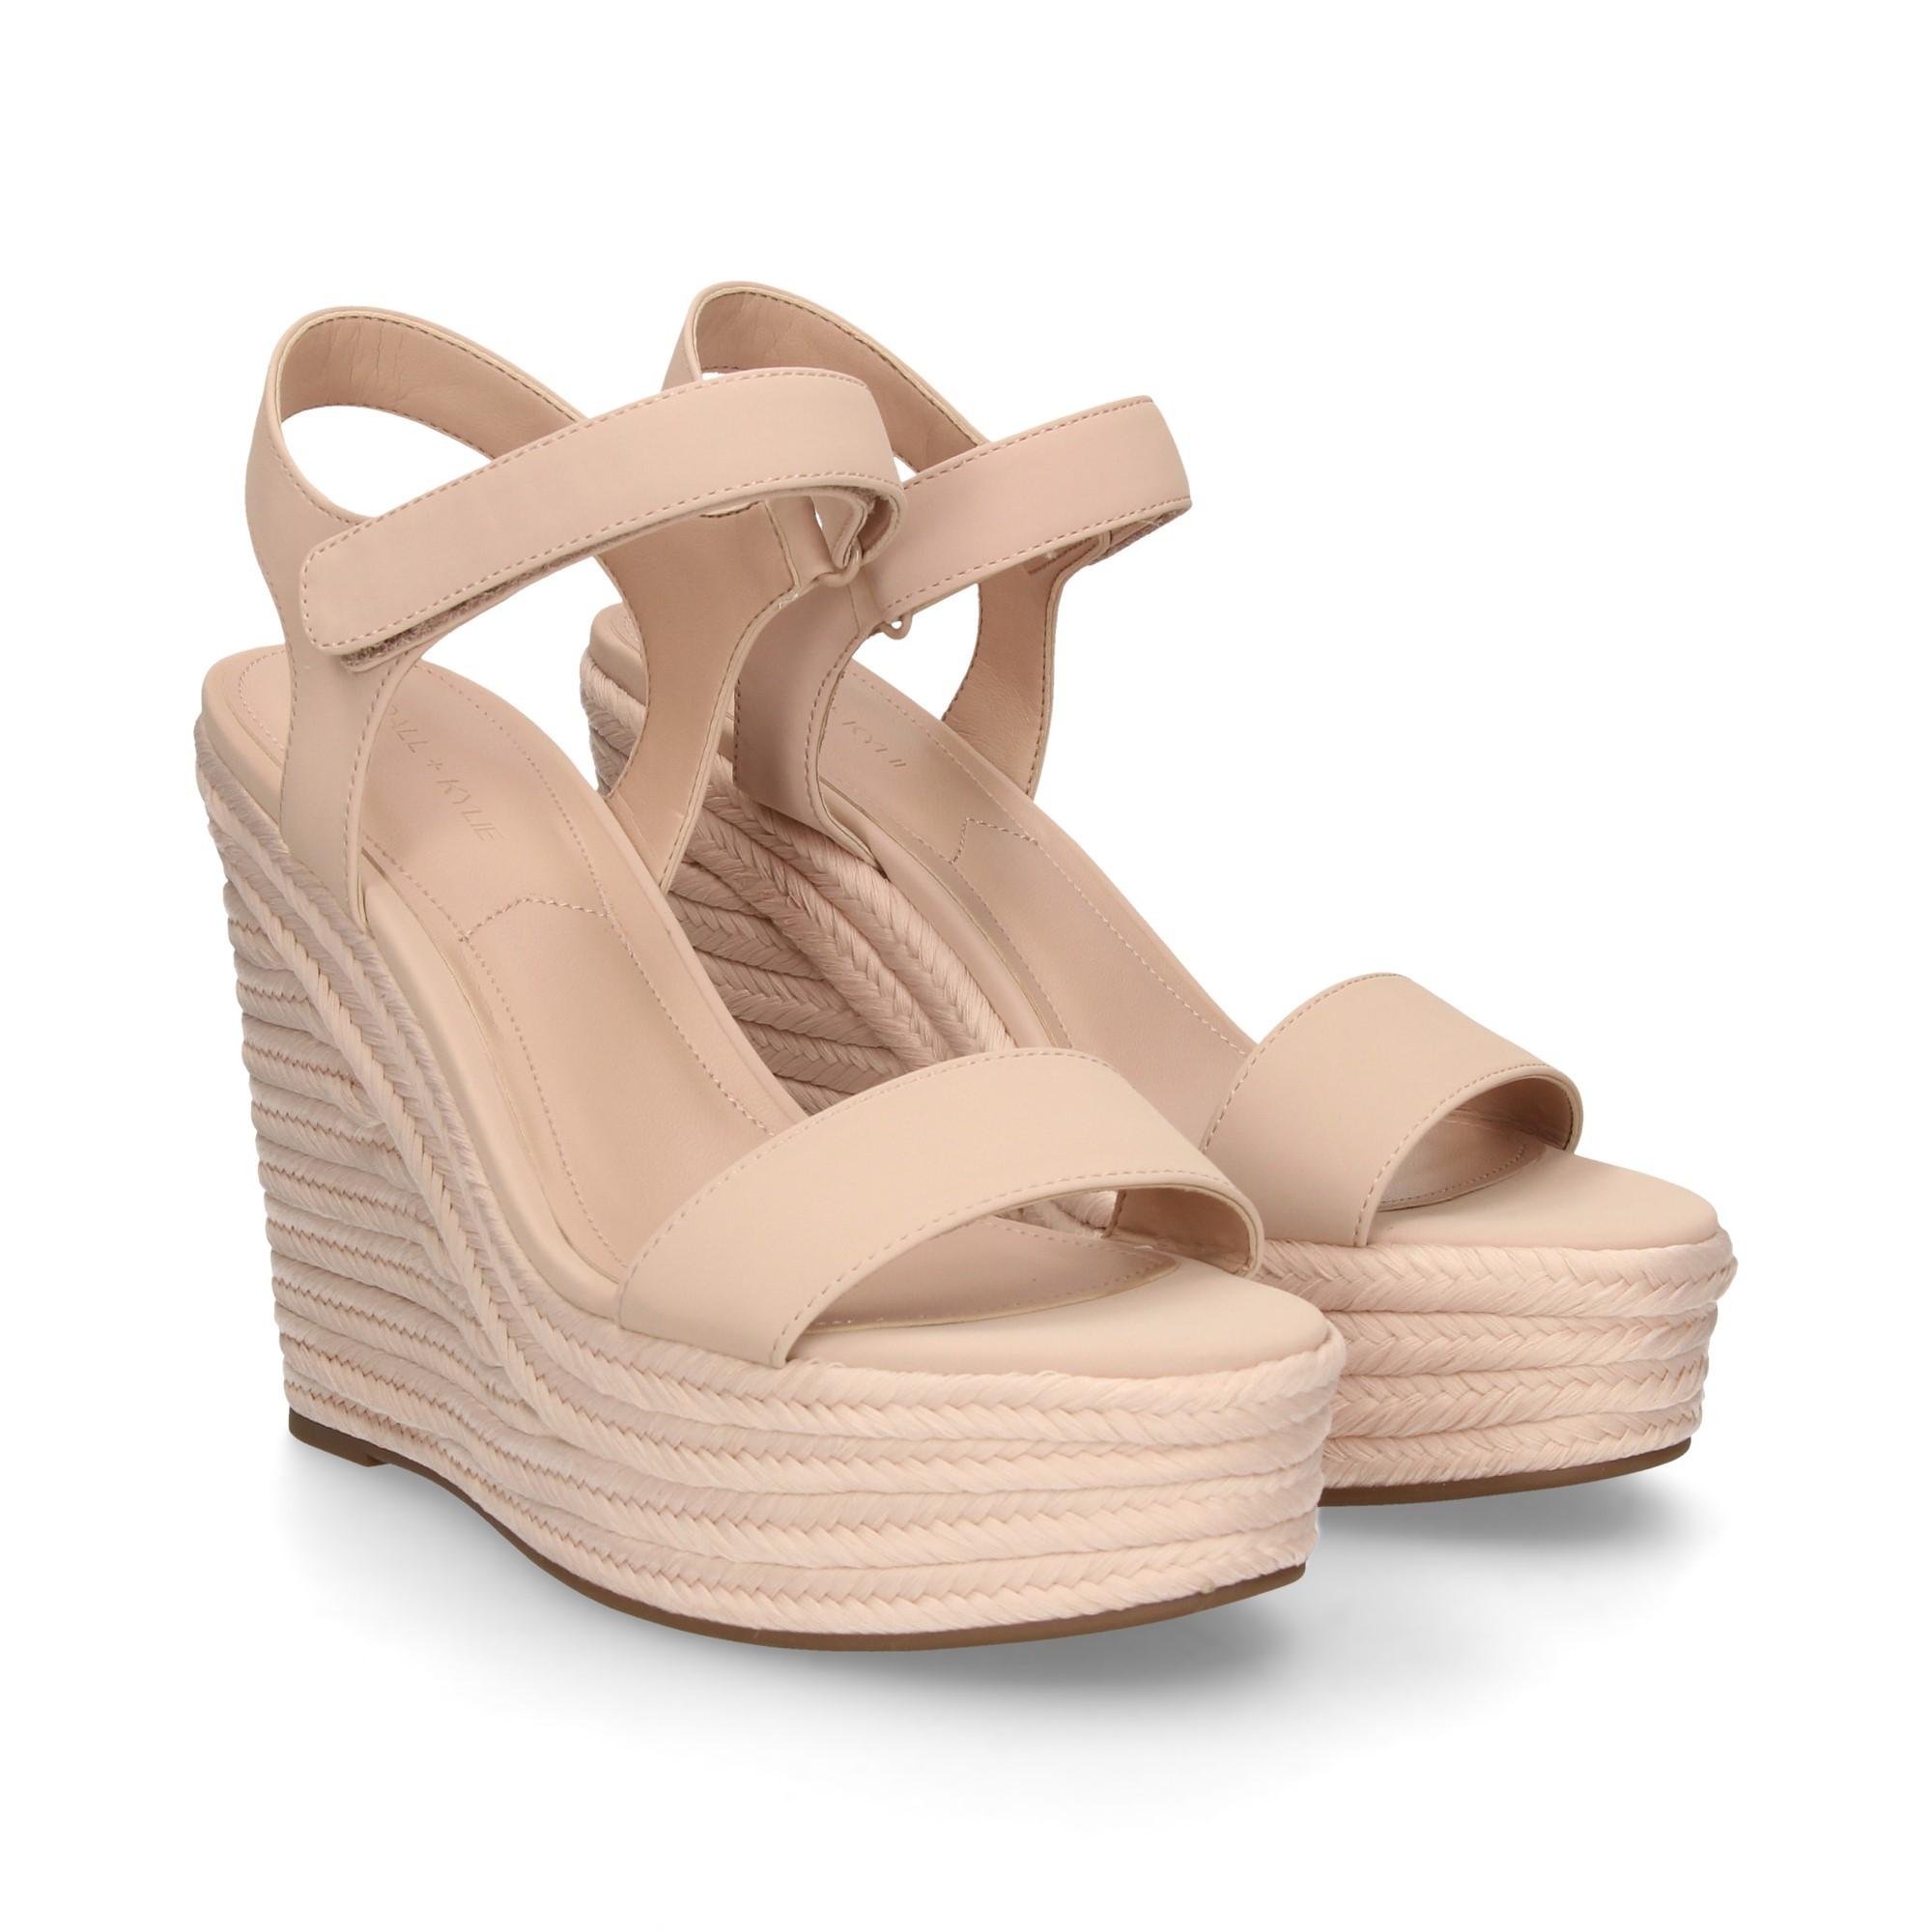 37b3274c98d28 KENDALL+KYLIE Women's wedge sandals KKGRANO2 24 SOFT PINK